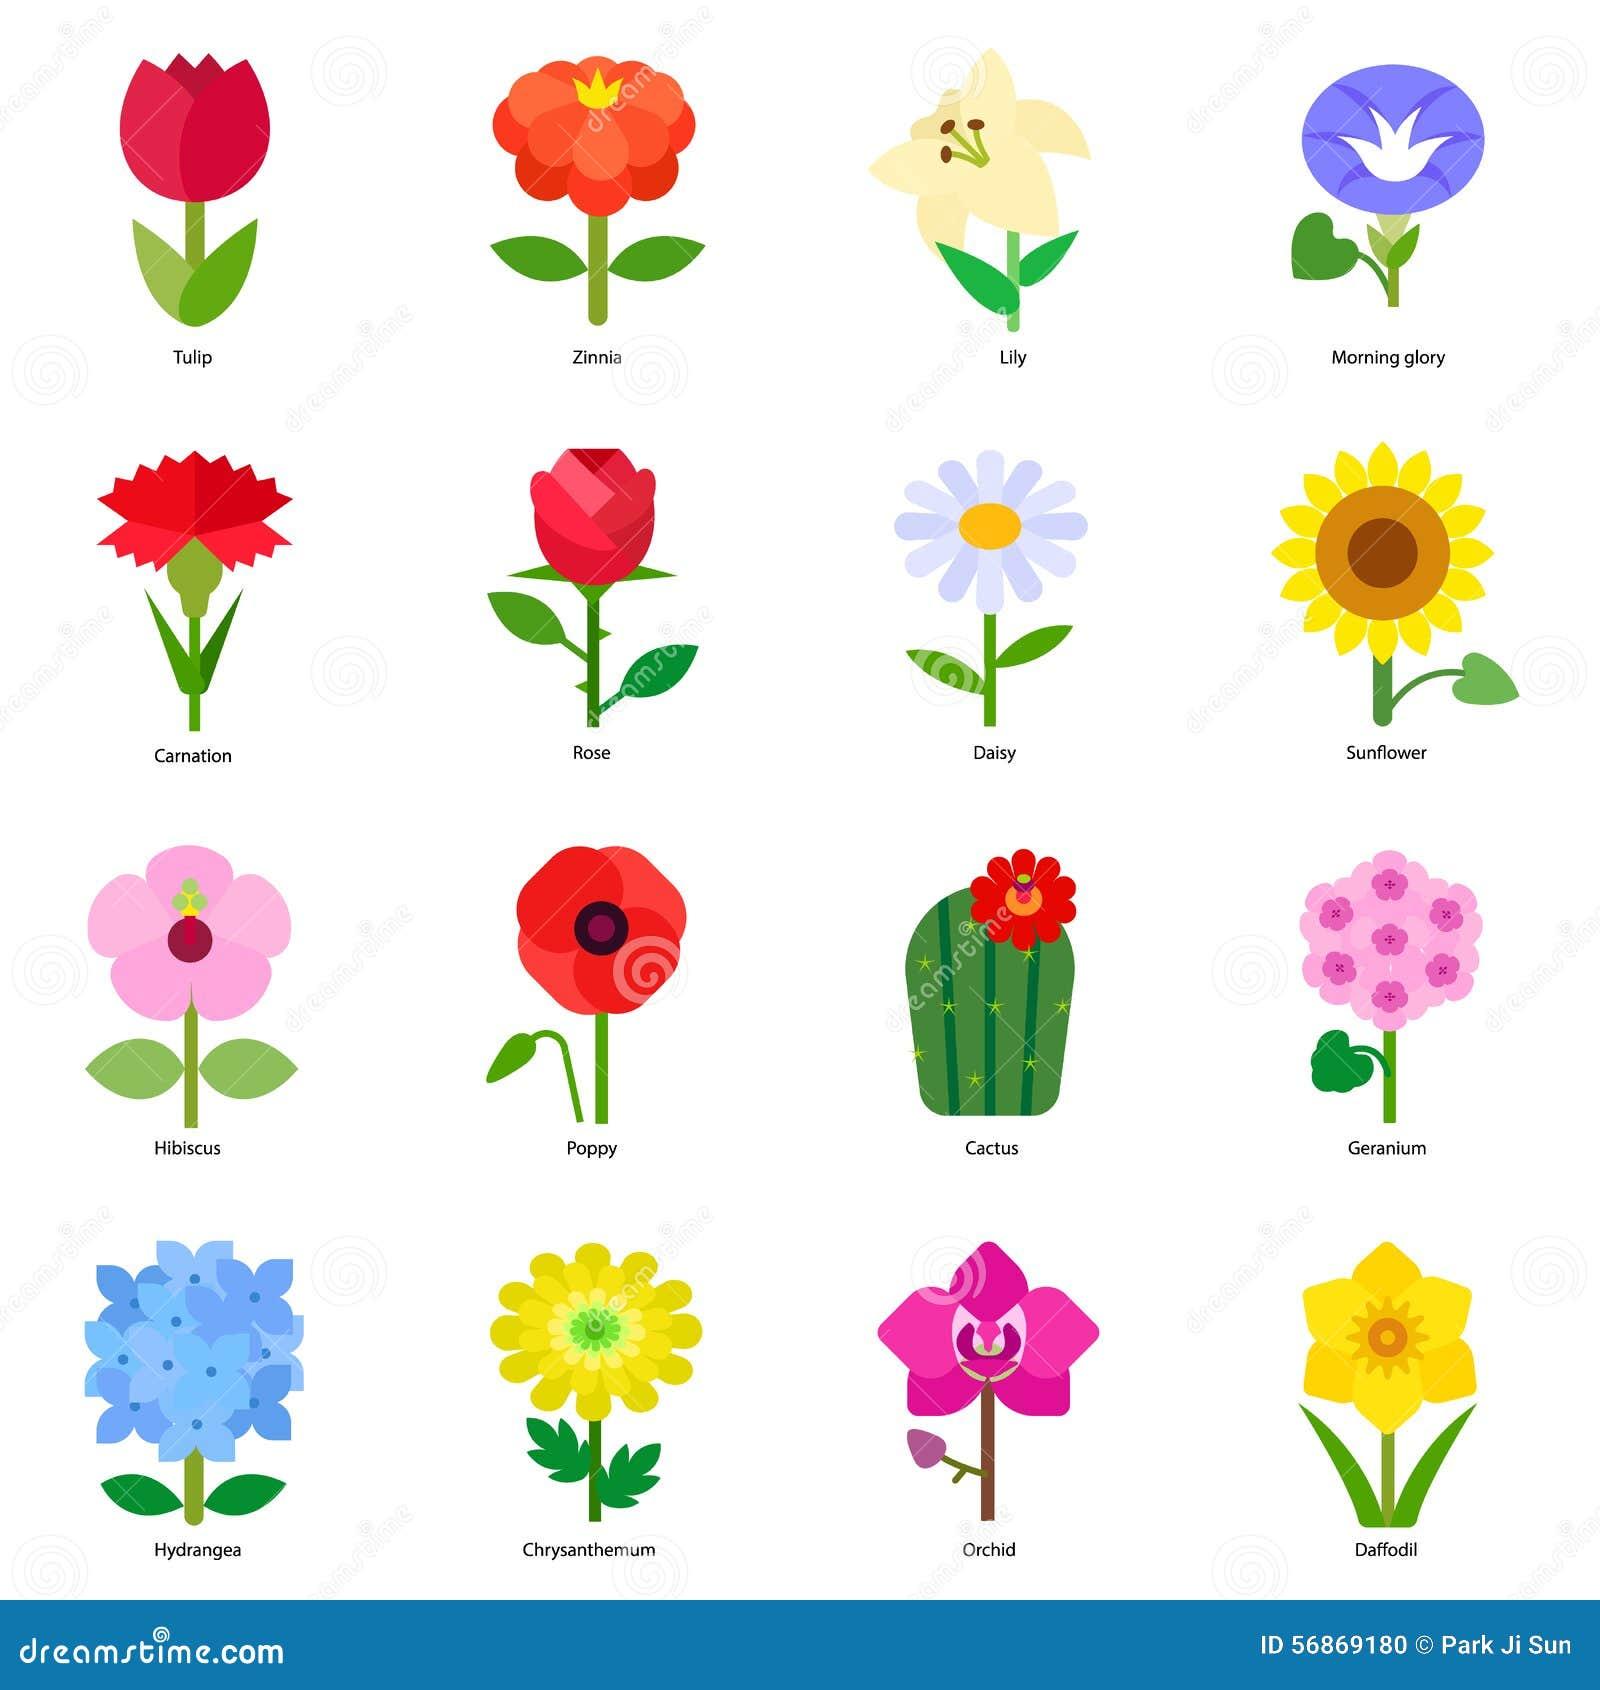 Flowers stock vector. Illustration of icon, tulip ...